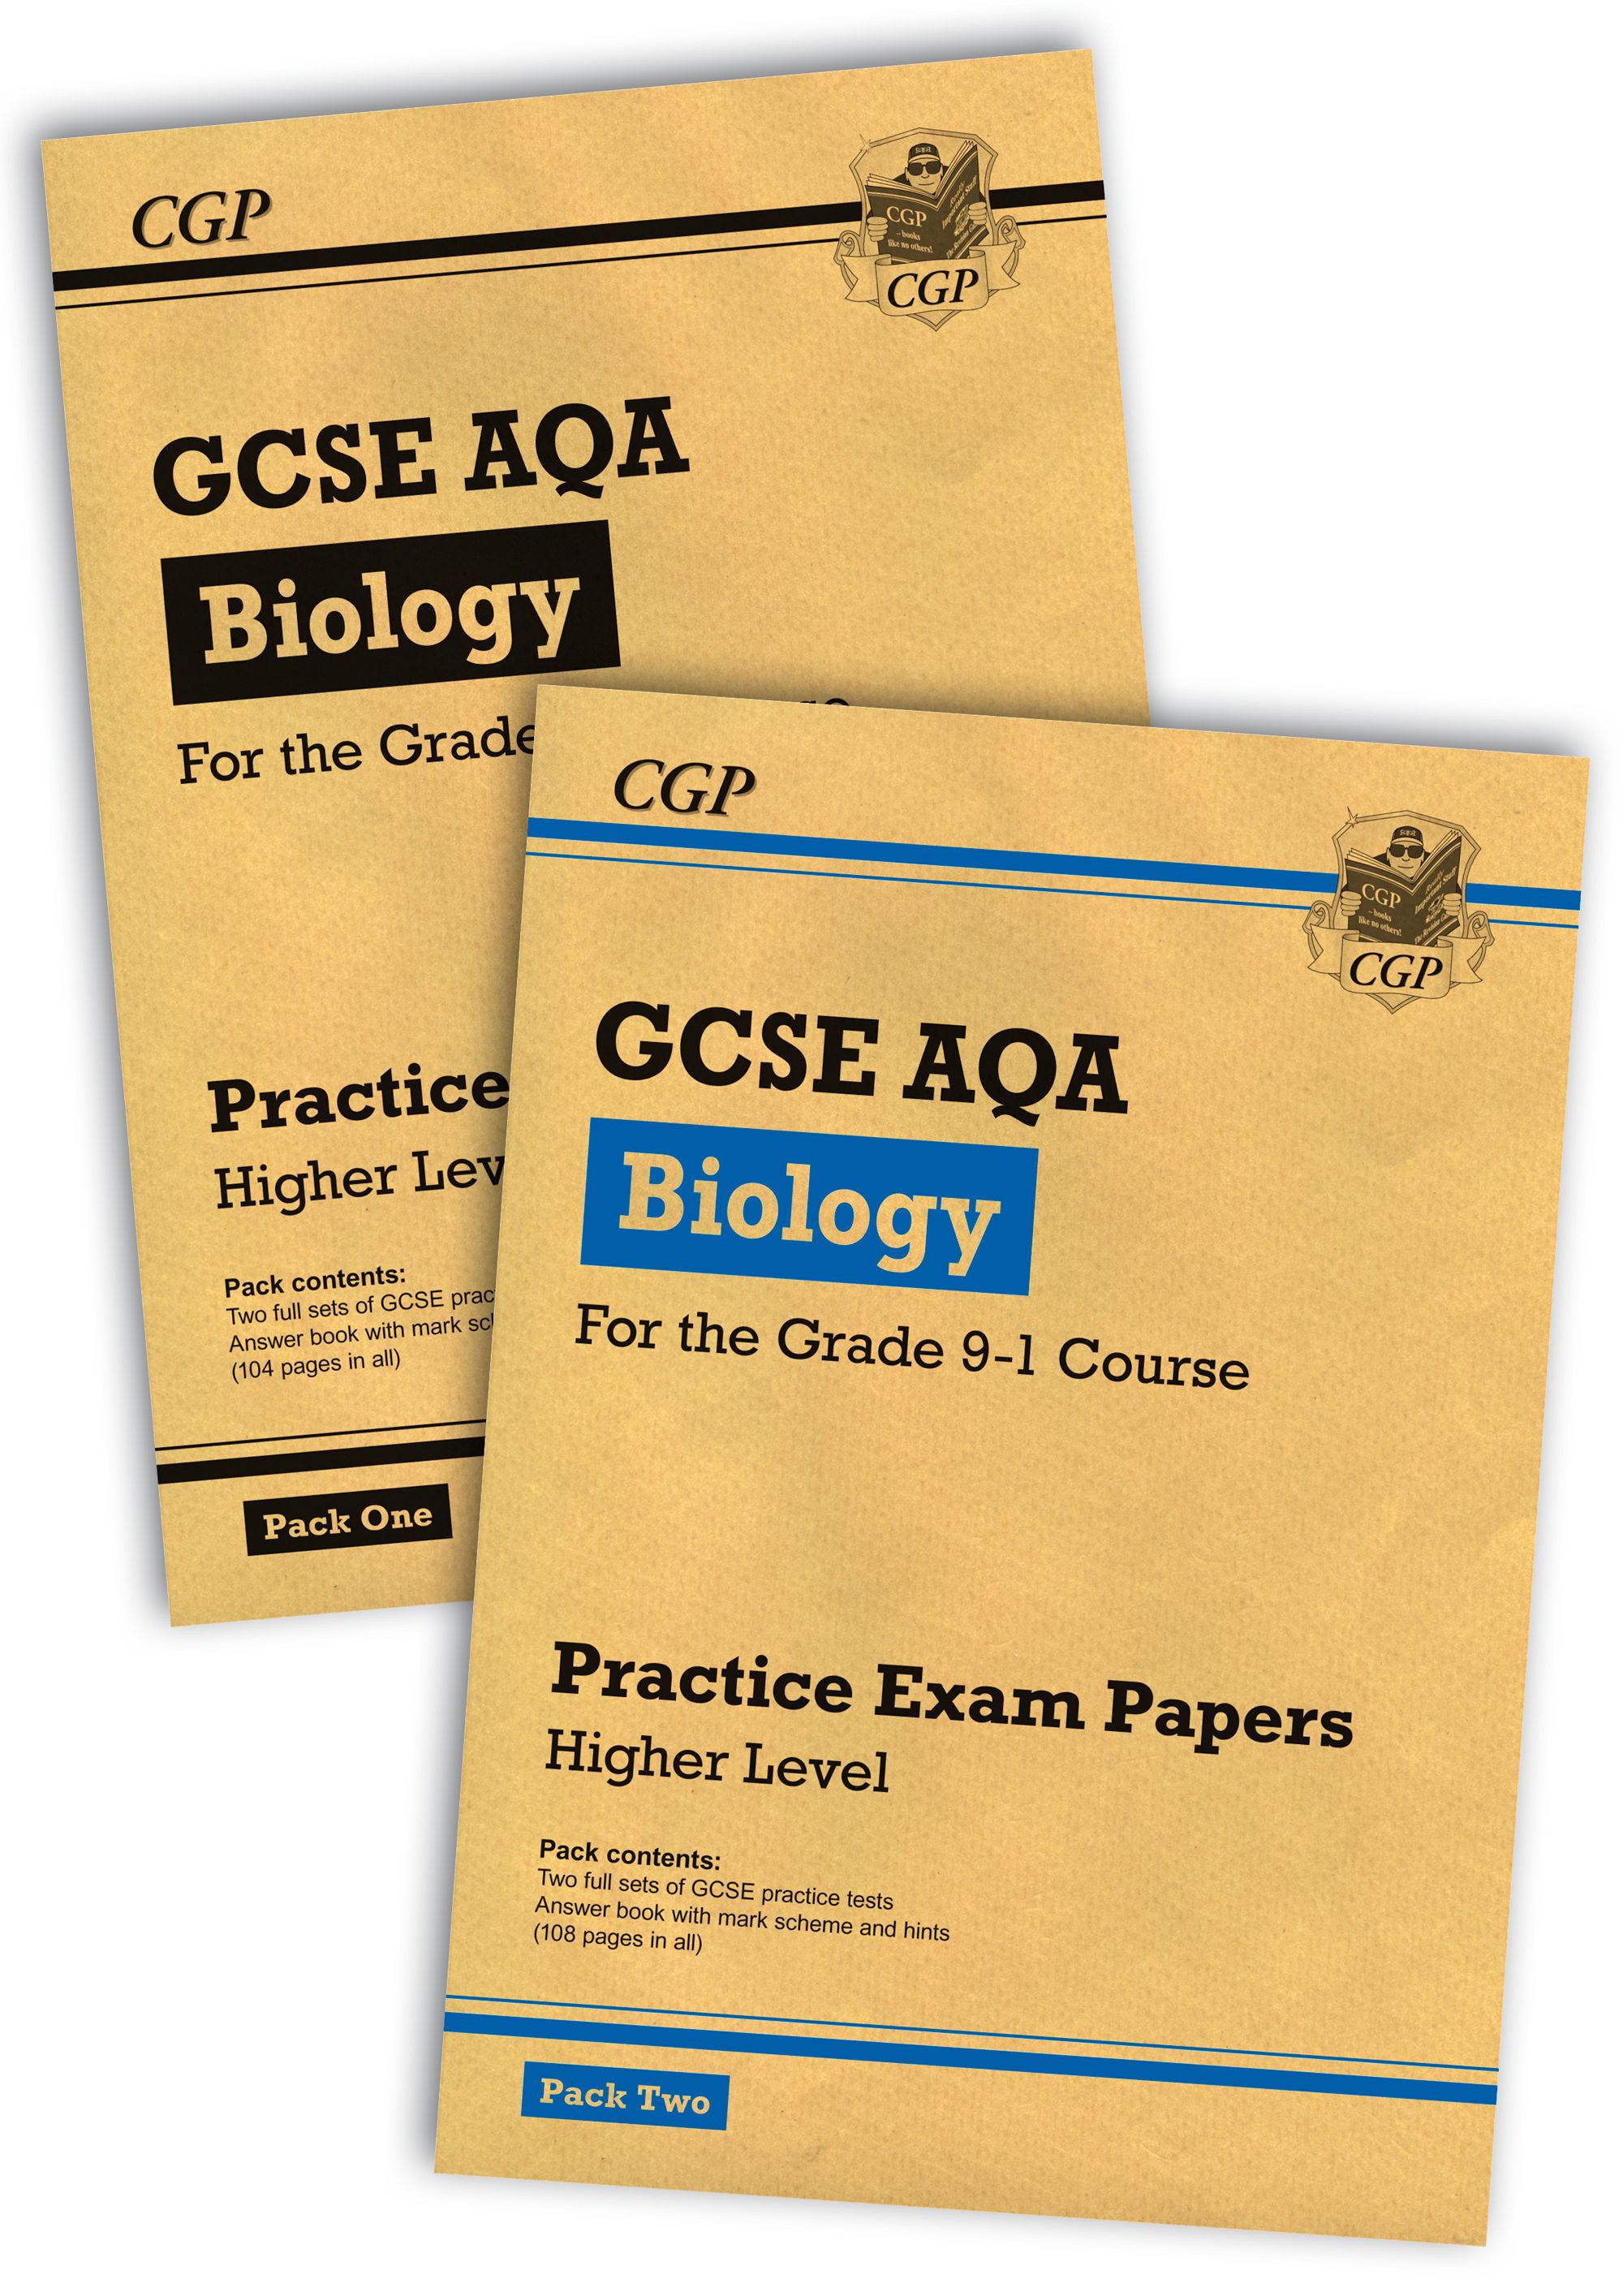 Grade 9-1 GCSE Biology AQA Practice Papers: Higher Pack 1 & 2 Bundle